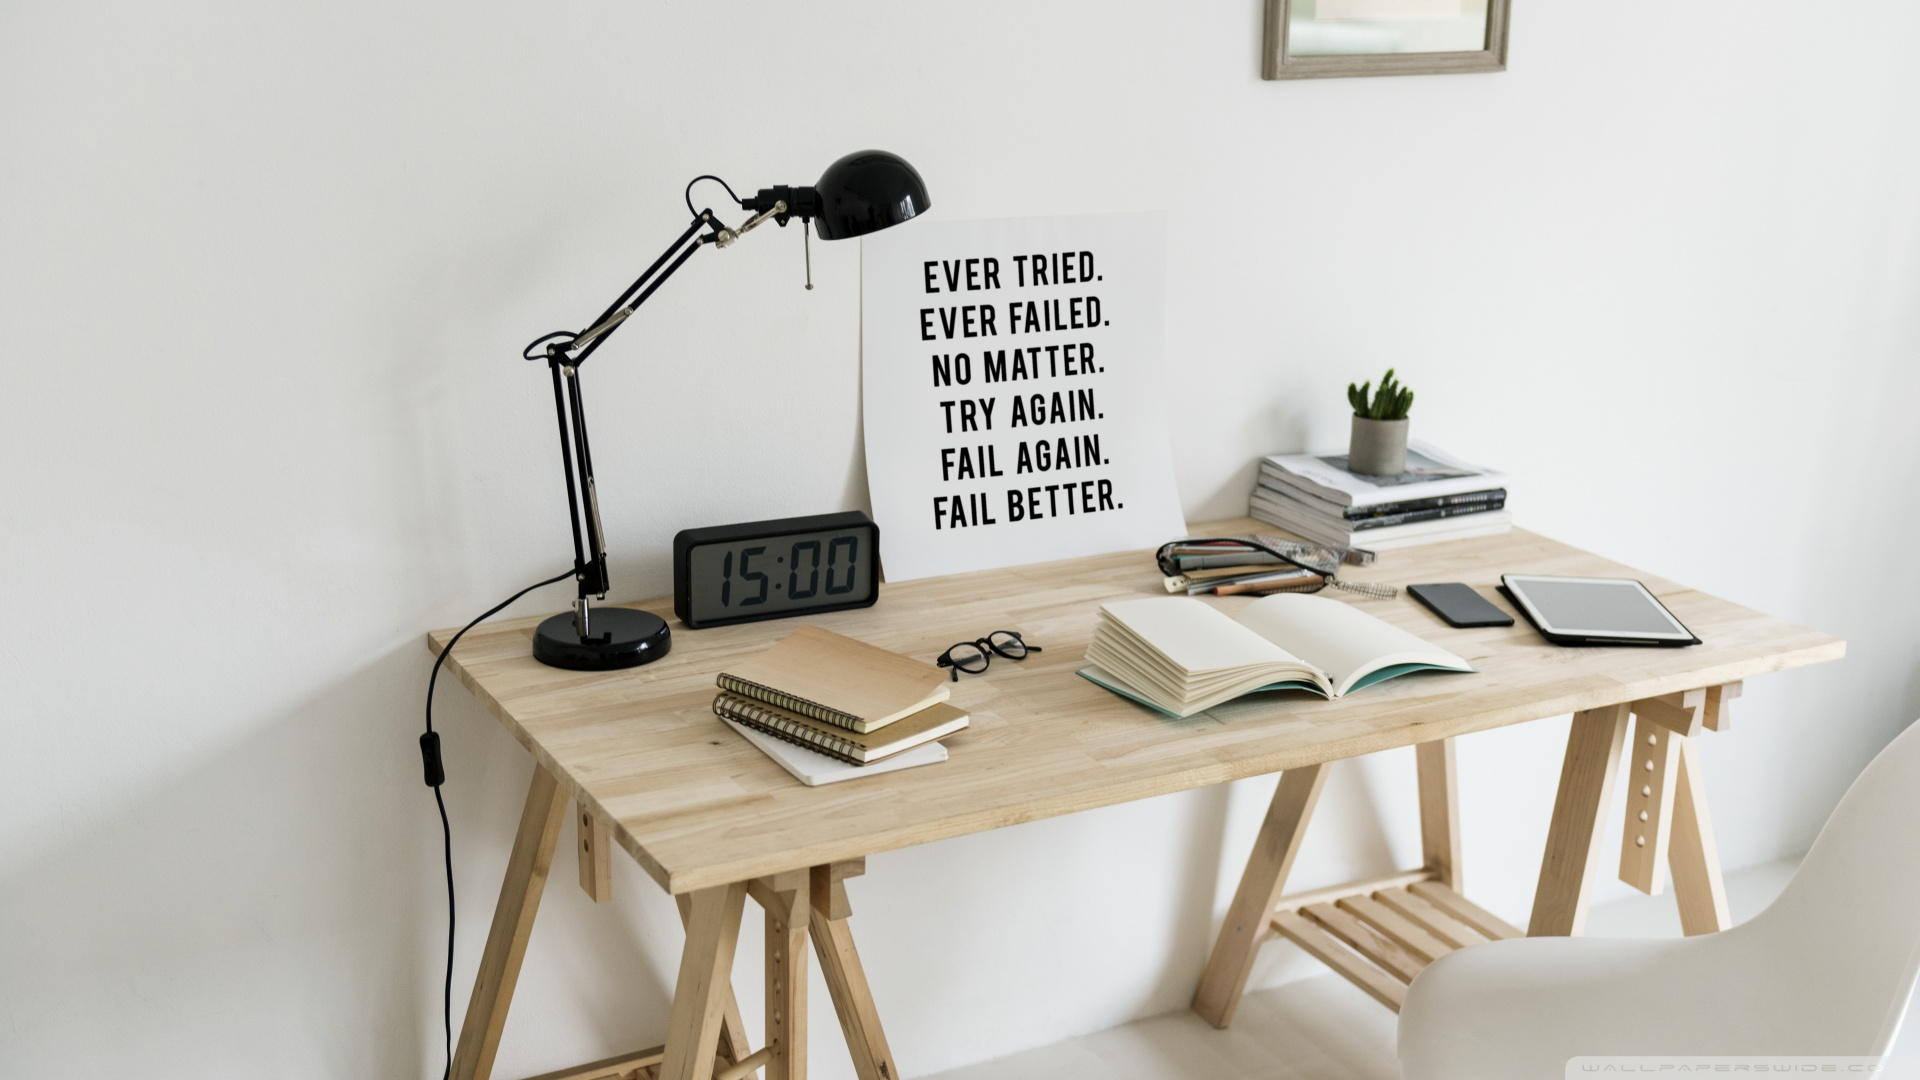 Minimal Workspace Motivational Quote 4k Hd Desktop Wallpaper